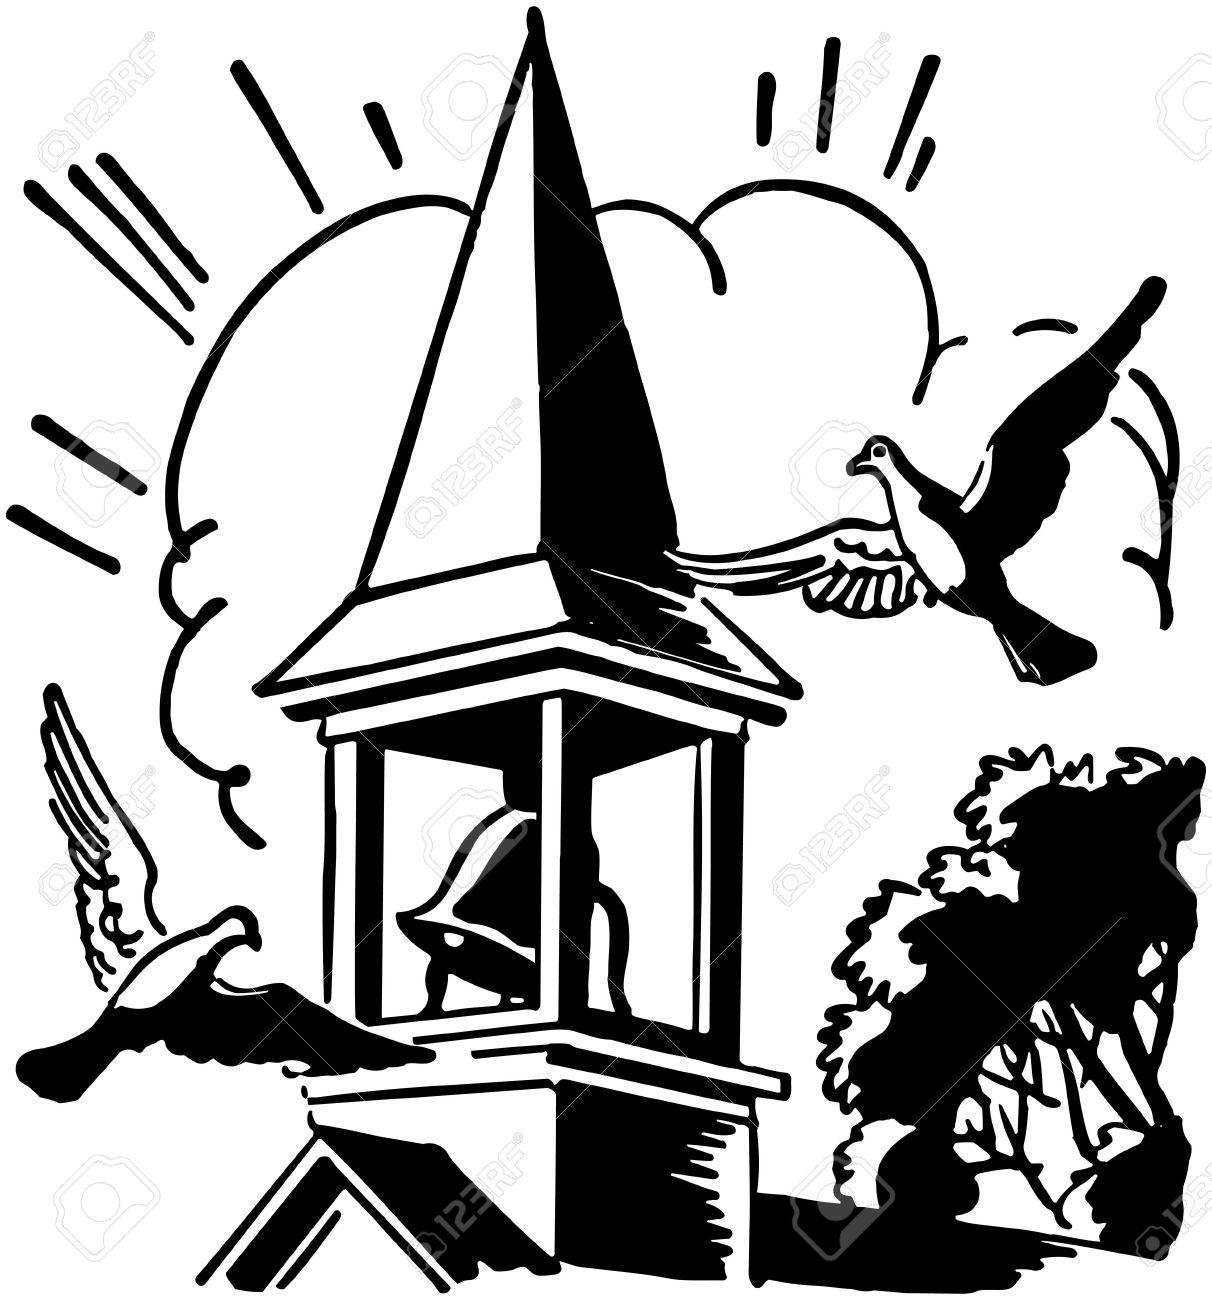 Church bell ringing clipart.